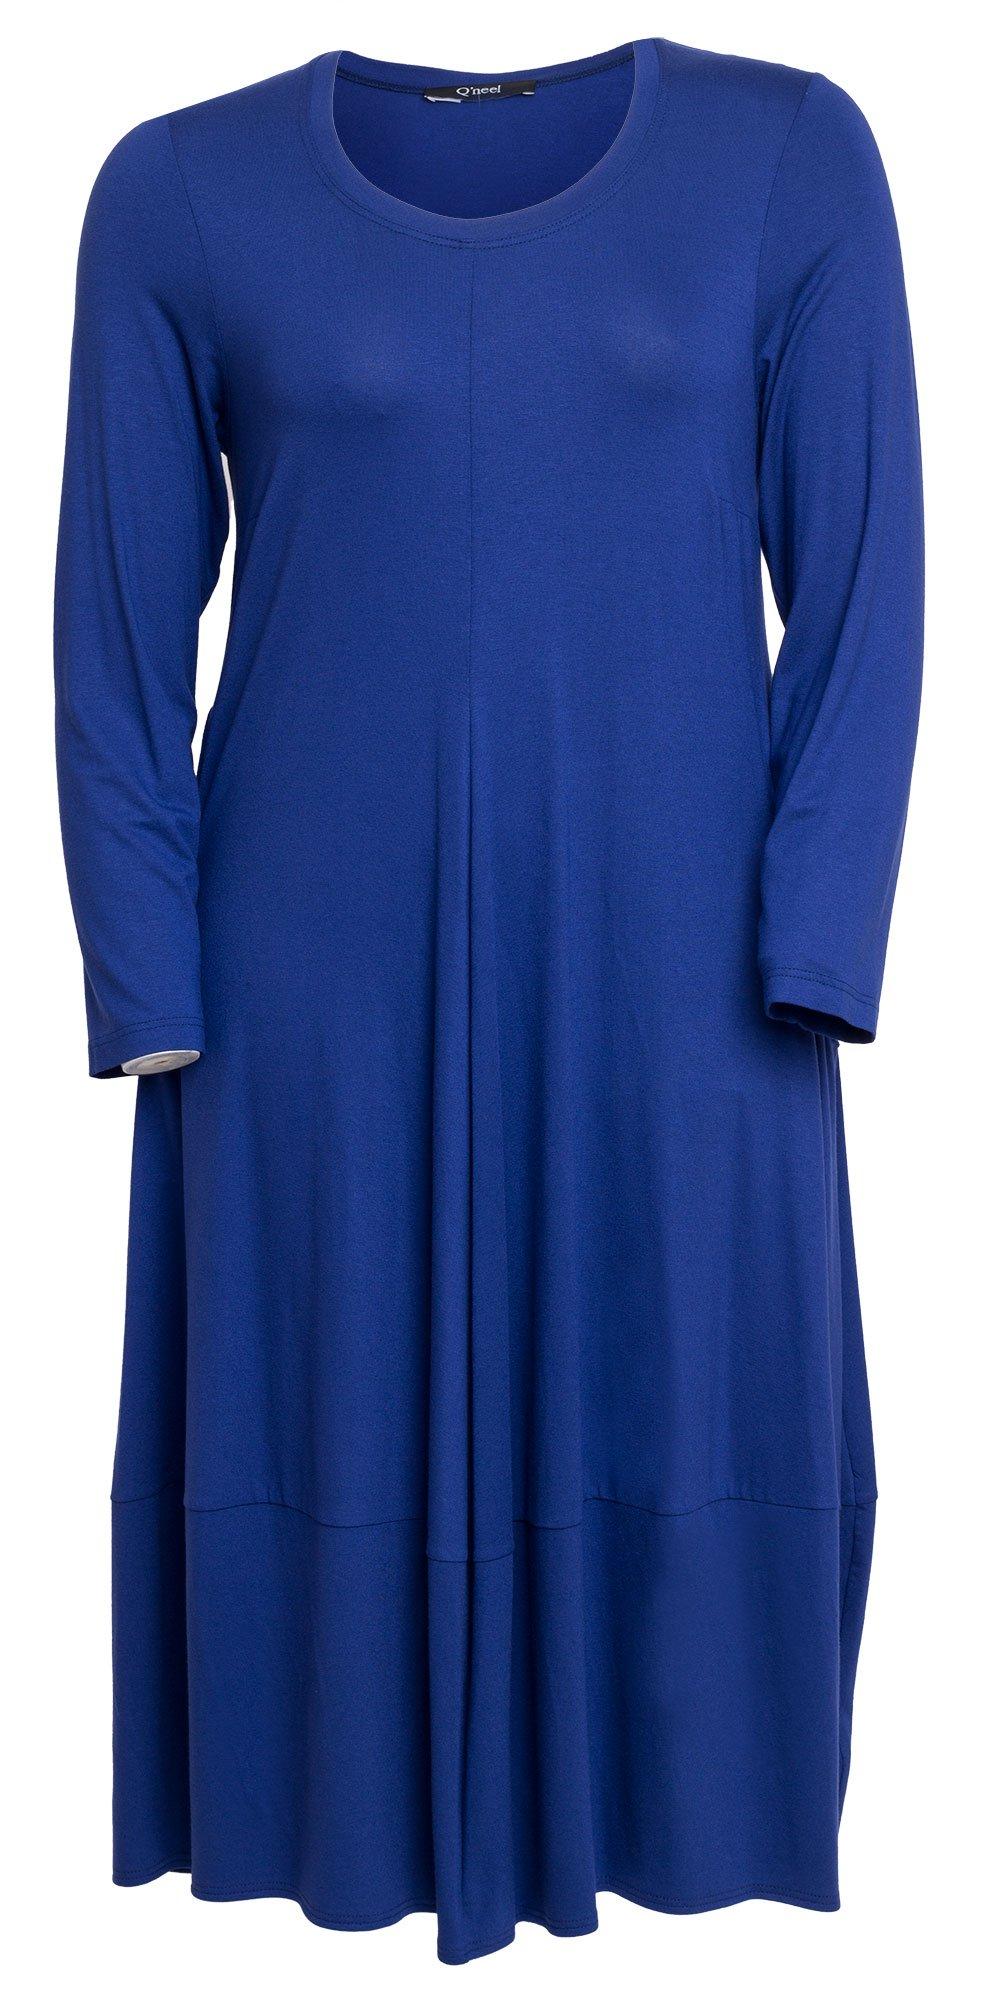 Lang lilla kjole med lommer